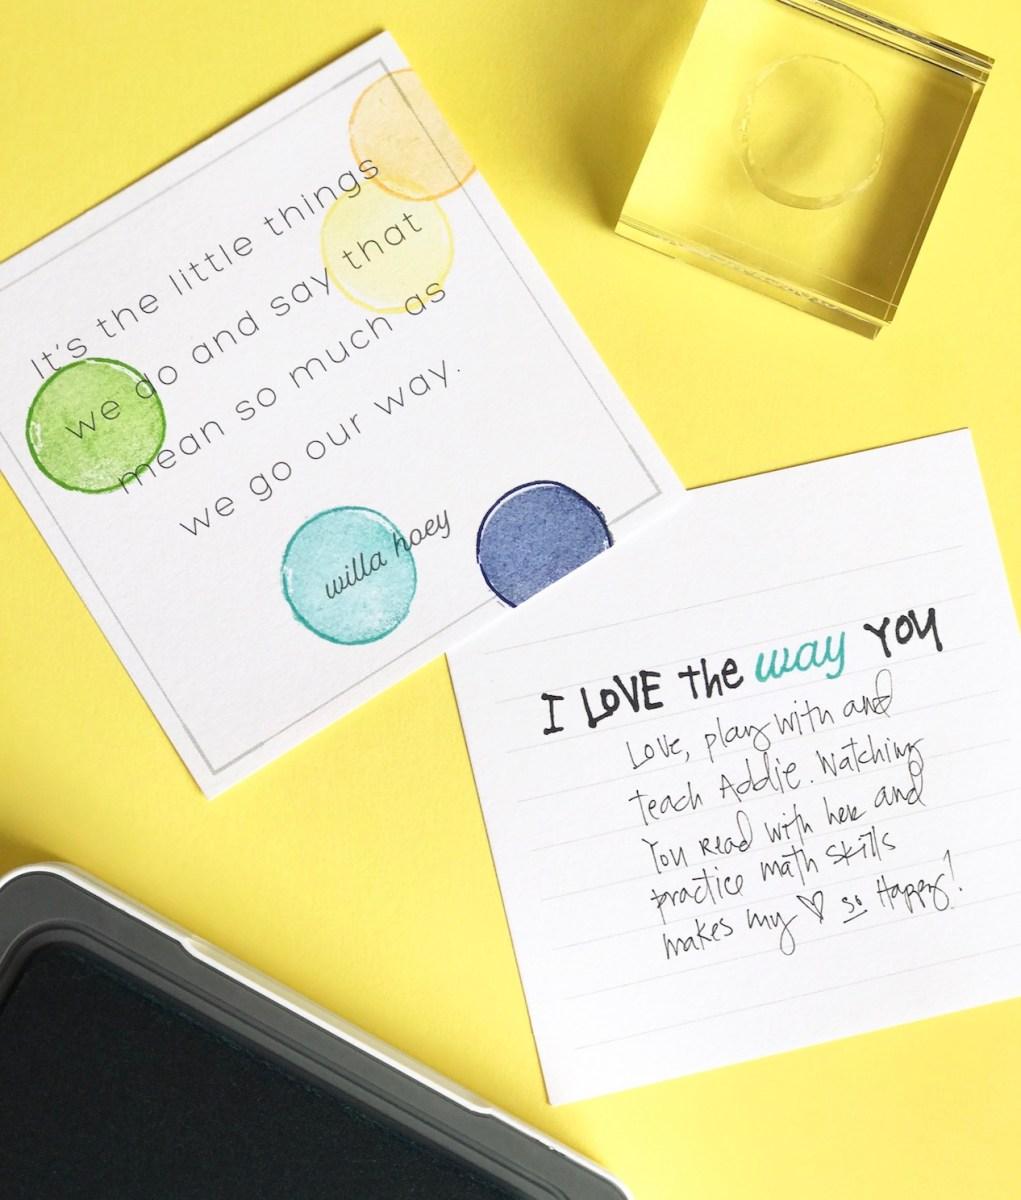 Stamping Story Starter #ctmh #closetomyheart #ctmhstacyjulian #ctmhxstacyjulian #ctmhstorystarter #stamping #quoteablewords #ctmhquoteablewords #colorfultextures #ctmhcolorfultextures #MyAcrylix #stamping #stampset #journaling #journalling #stacyjulian #minialbum #album #stories #Ilovethewayyou